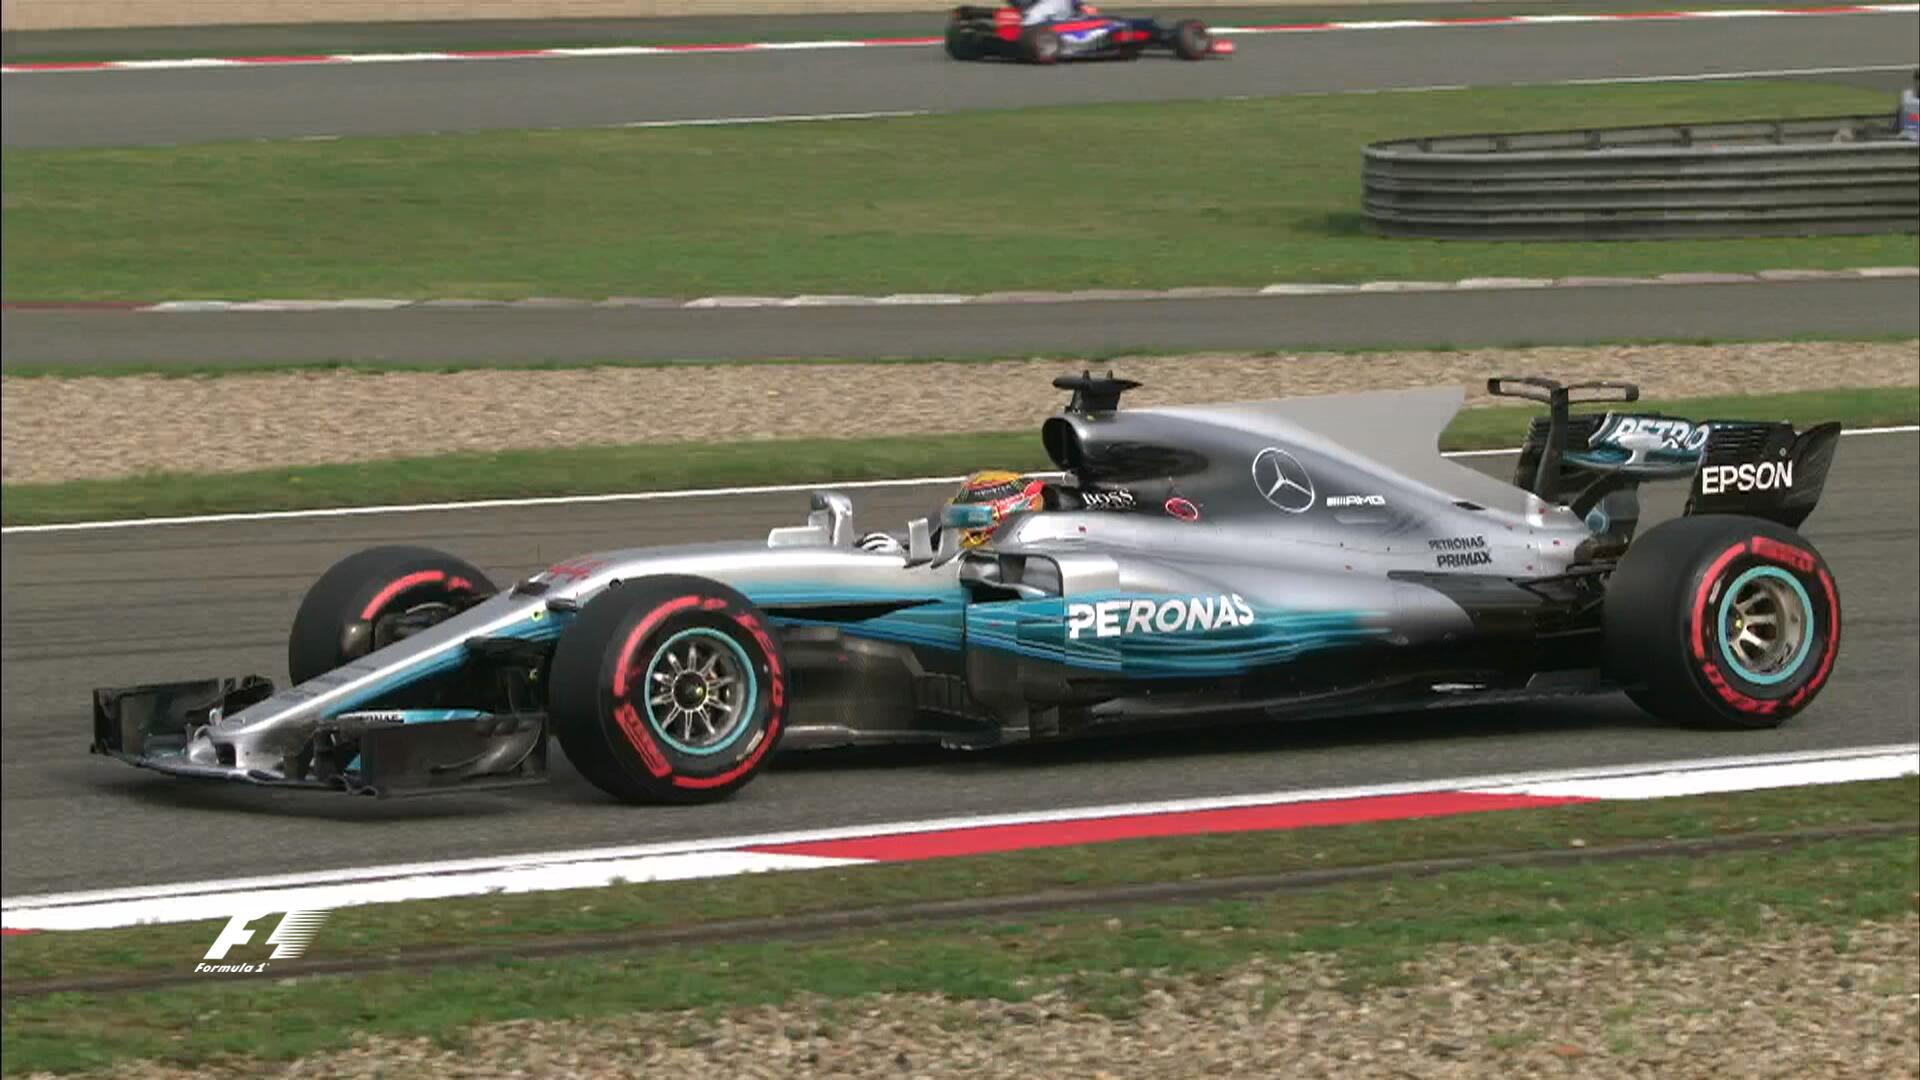 «Формула-1» вШанхае. Хэмилтон одержал победу квалификацию, Квят опередил конкурента